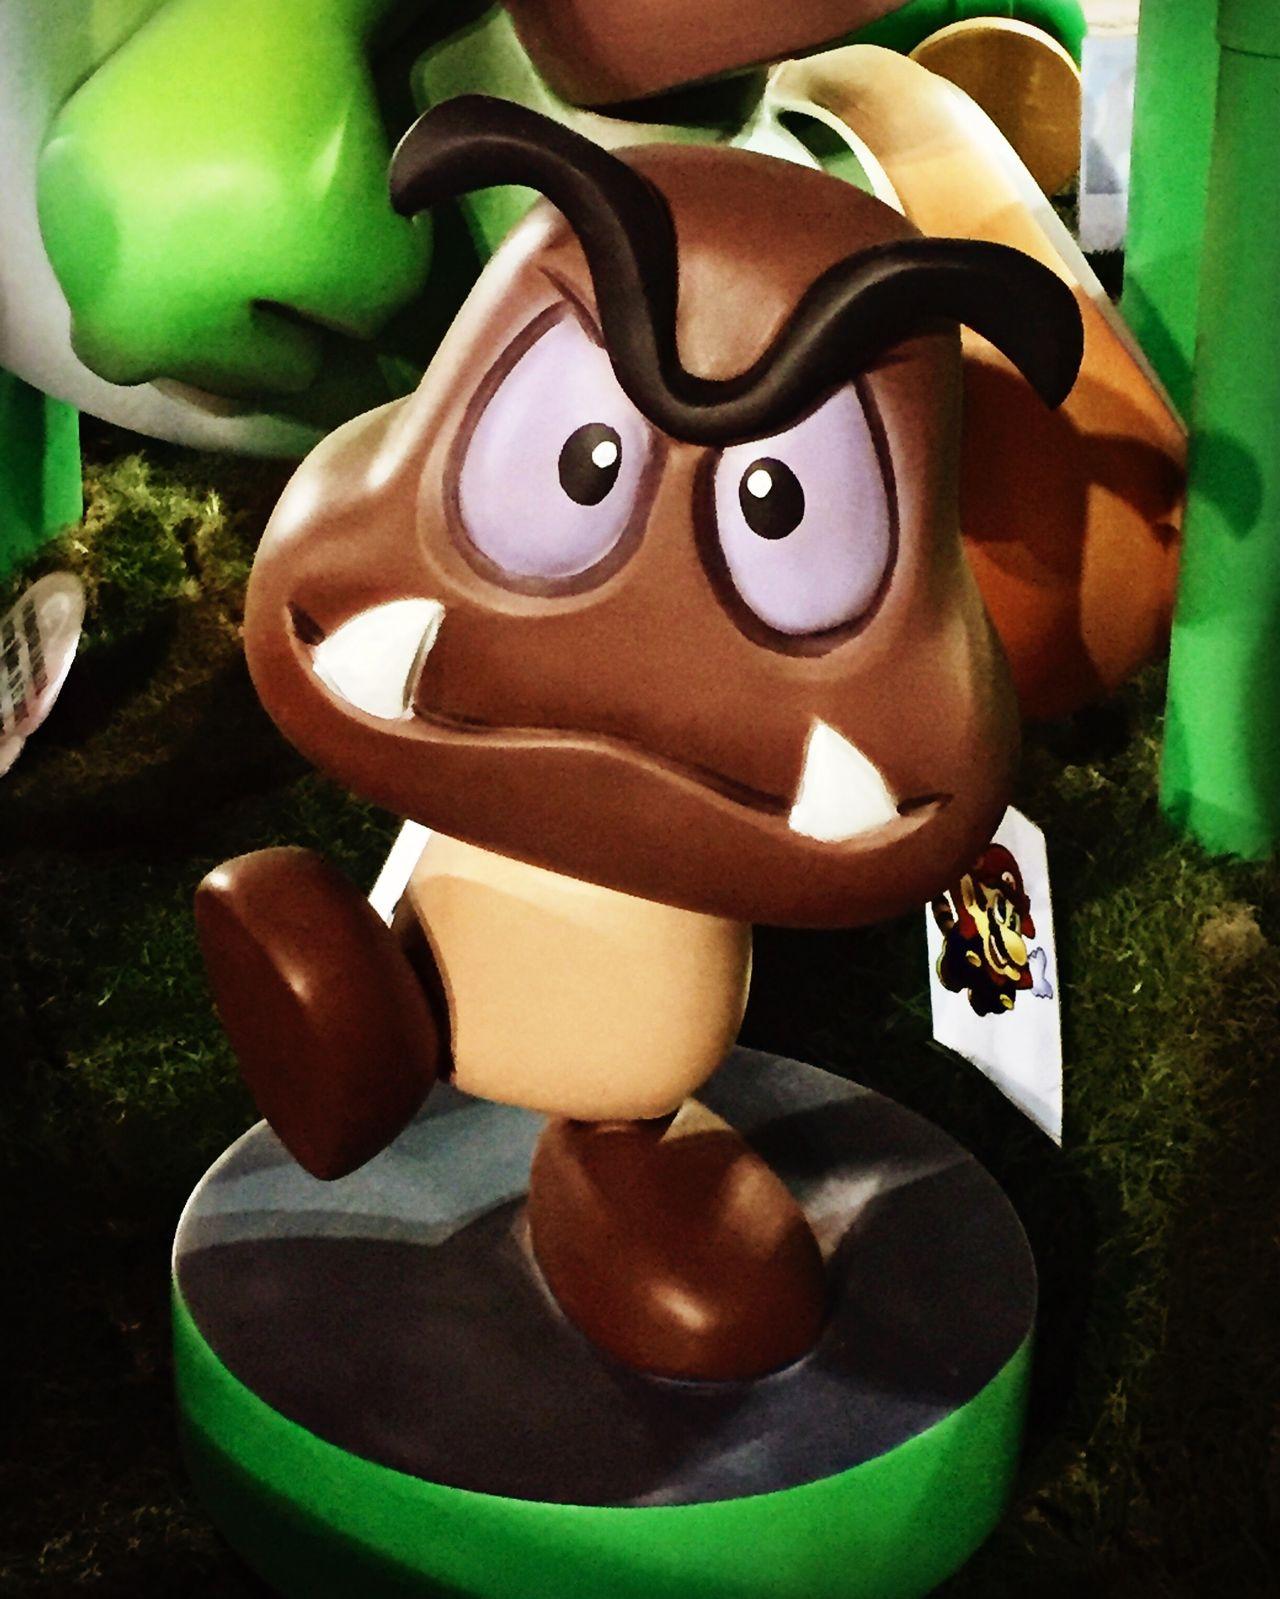 Mushroom Mario Bros Art And Craft Celebration Sculpture Close-up No People Halloween Anthropomorphic Face Figurine  Statue Jack O Lantern Day Champiñon Mushroom Mario Bros